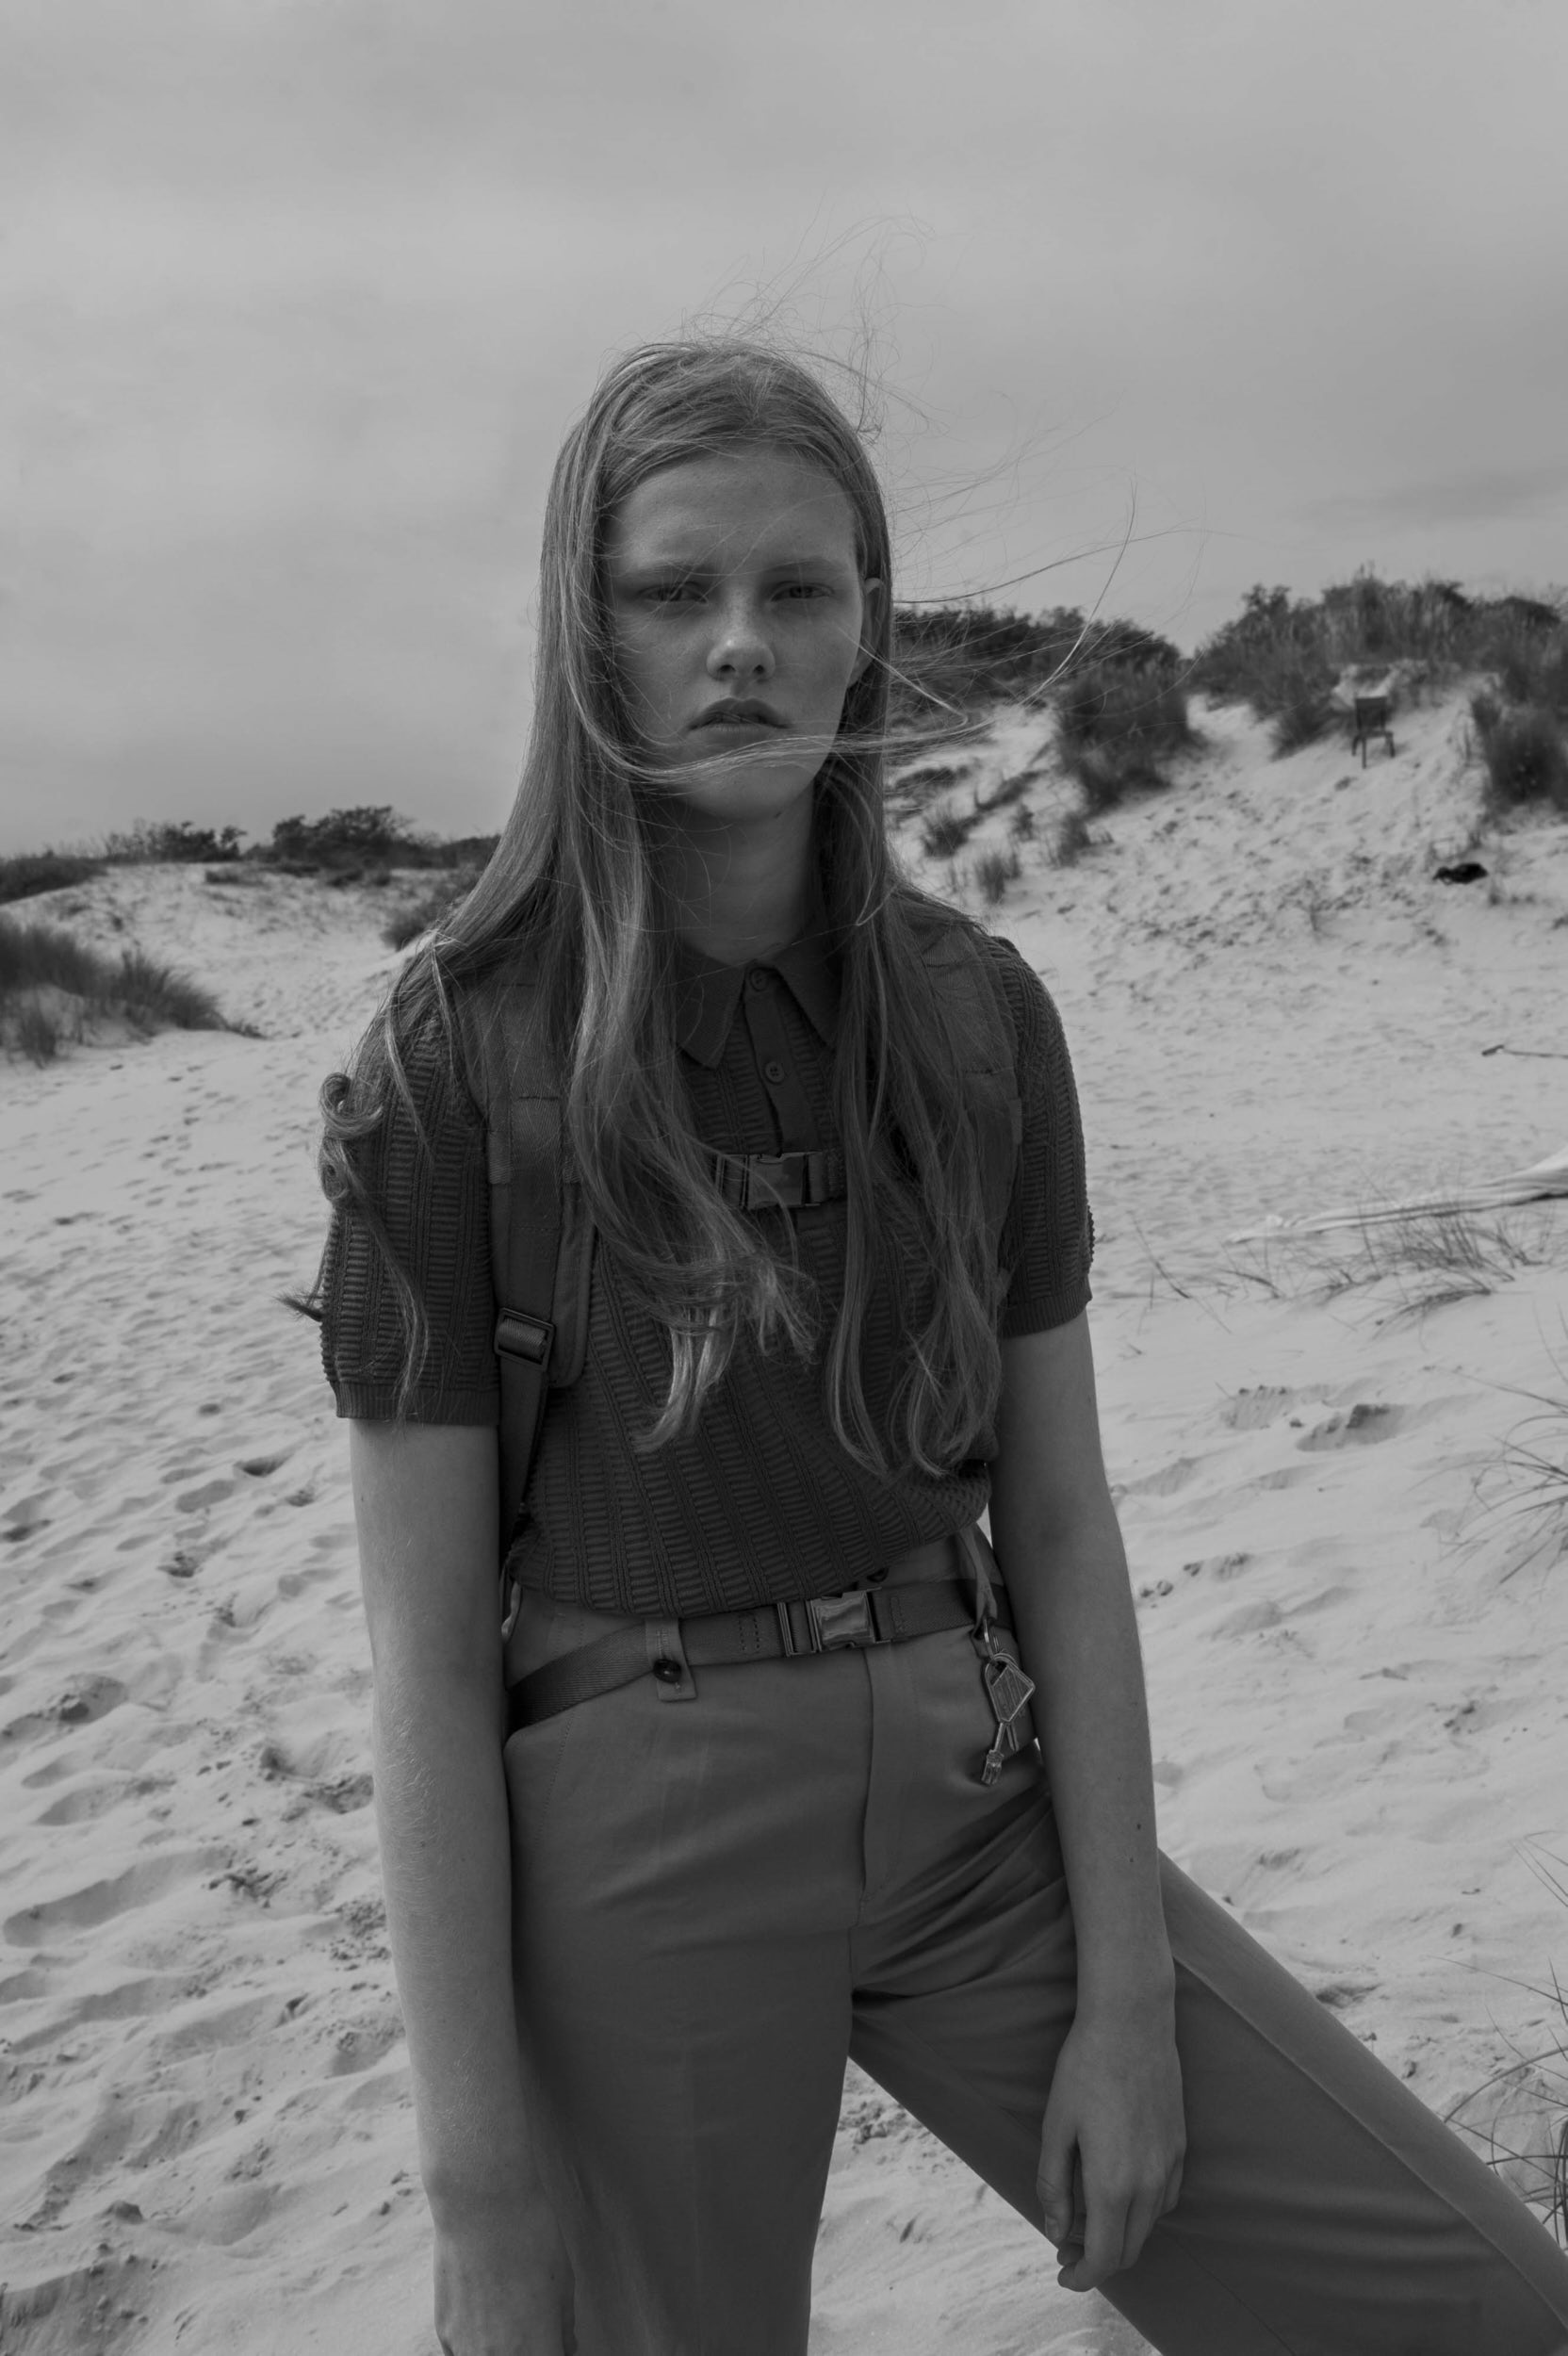 Sweater - Lacoste, Pants - Isabelle Marant, Backpack - Zara